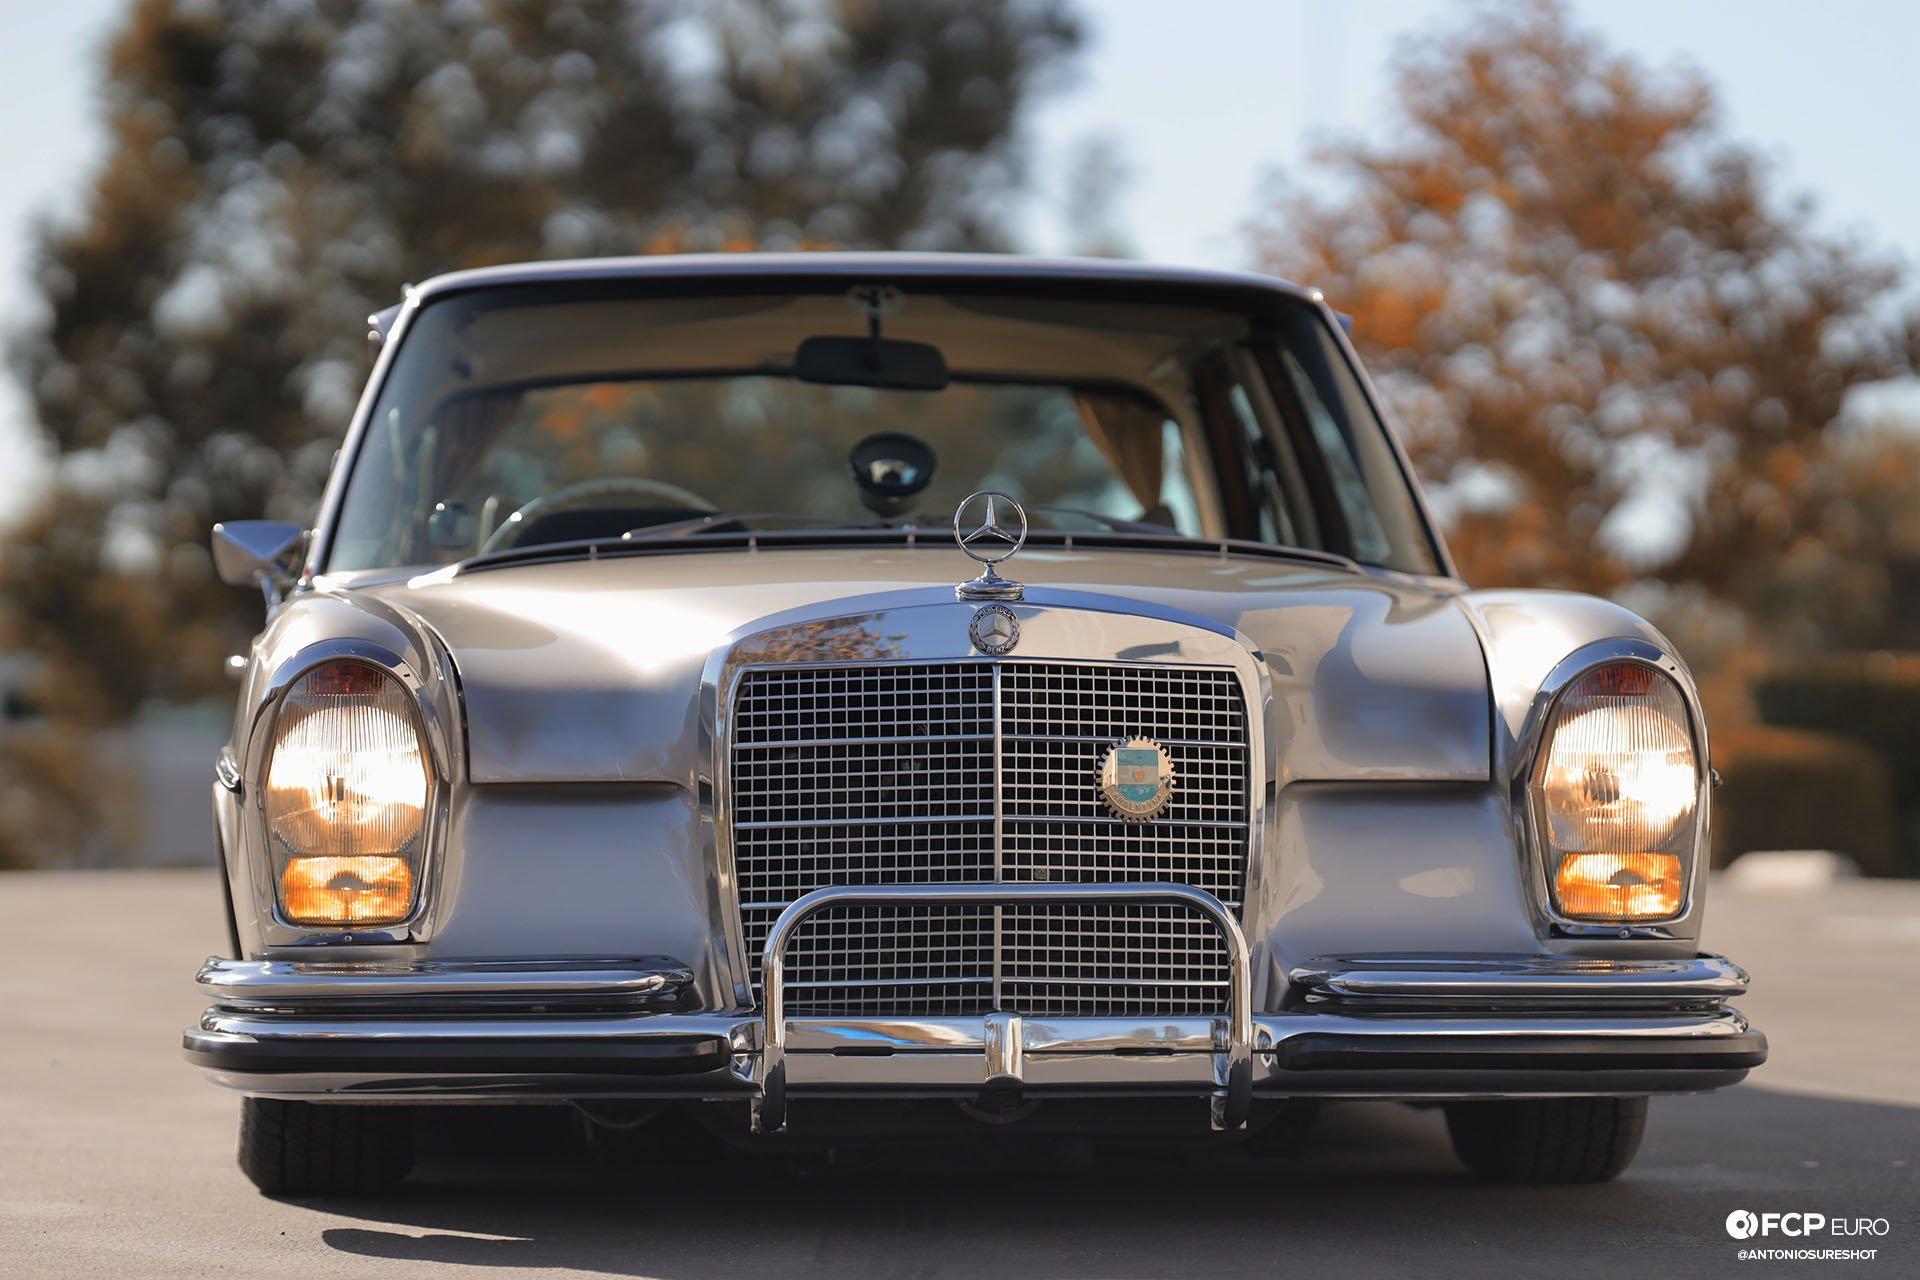 RHD 1972 Mercedes W108 280SE EOSR9760 crop